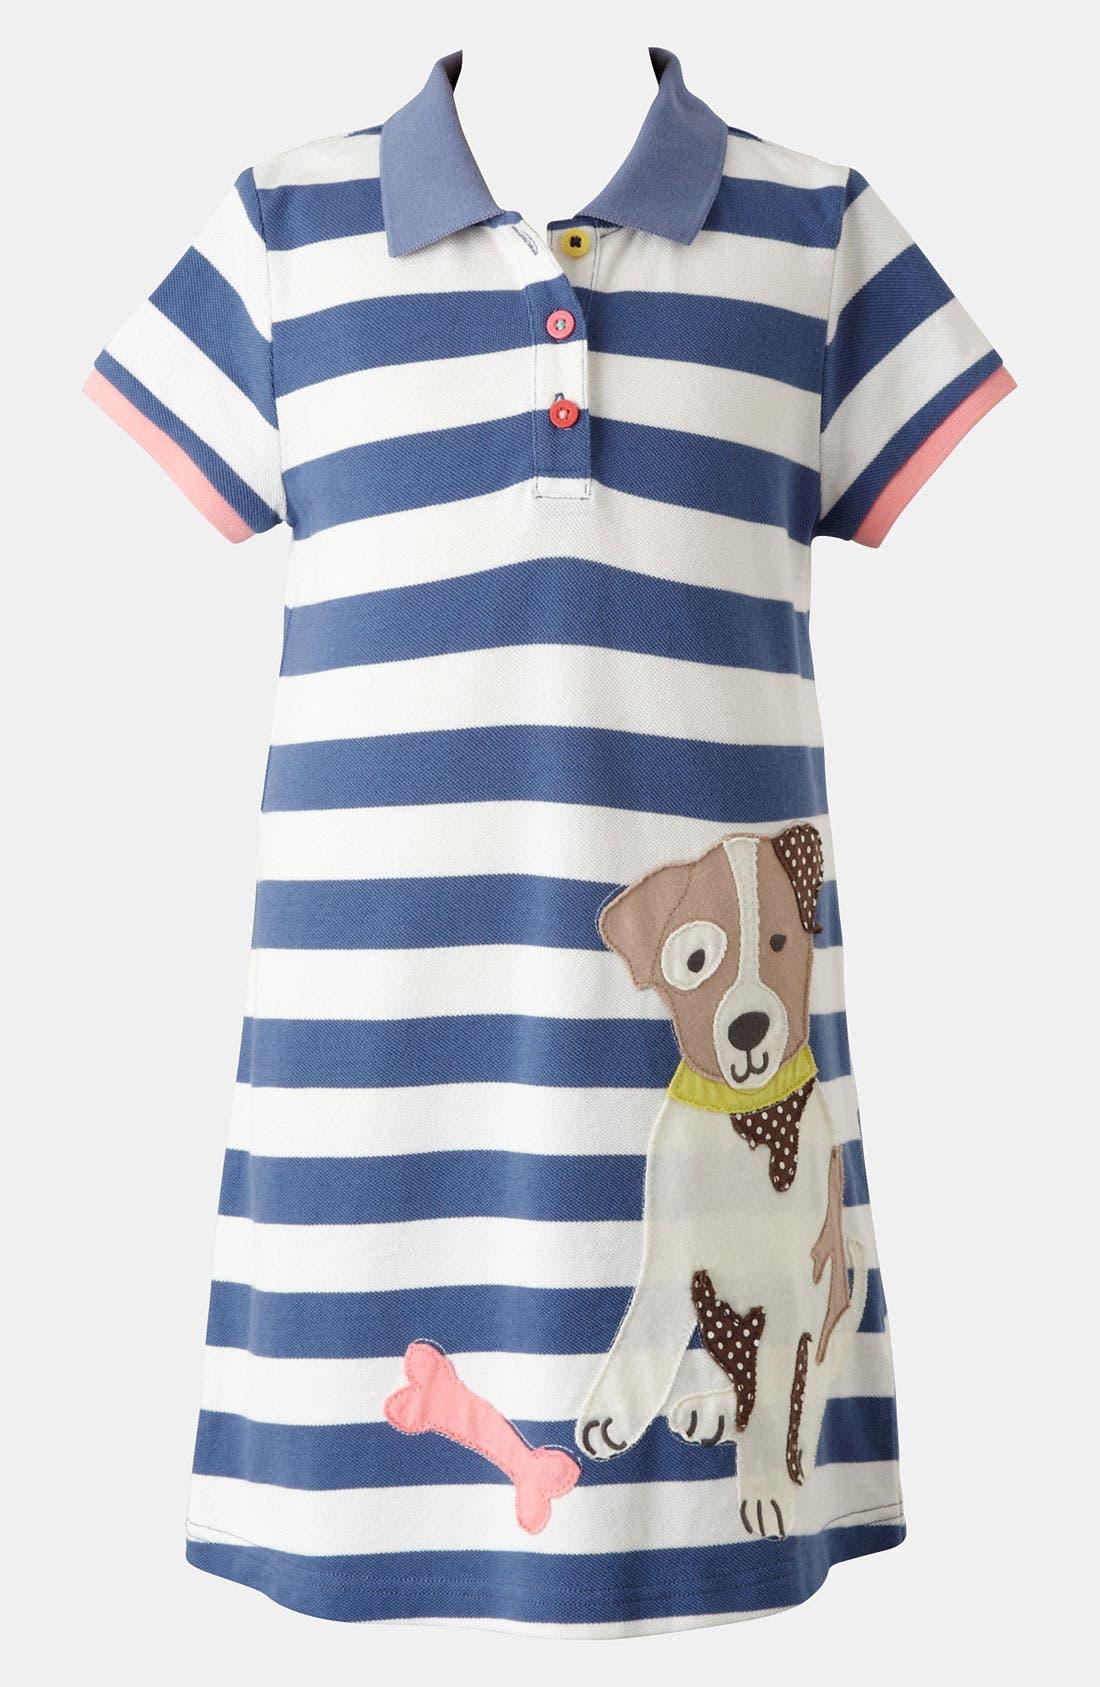 Alternate Image 1 Selected - Mini Boden 'Fun' Appliqué Polo Dress (Toddler, Little Girls & Big Girls)